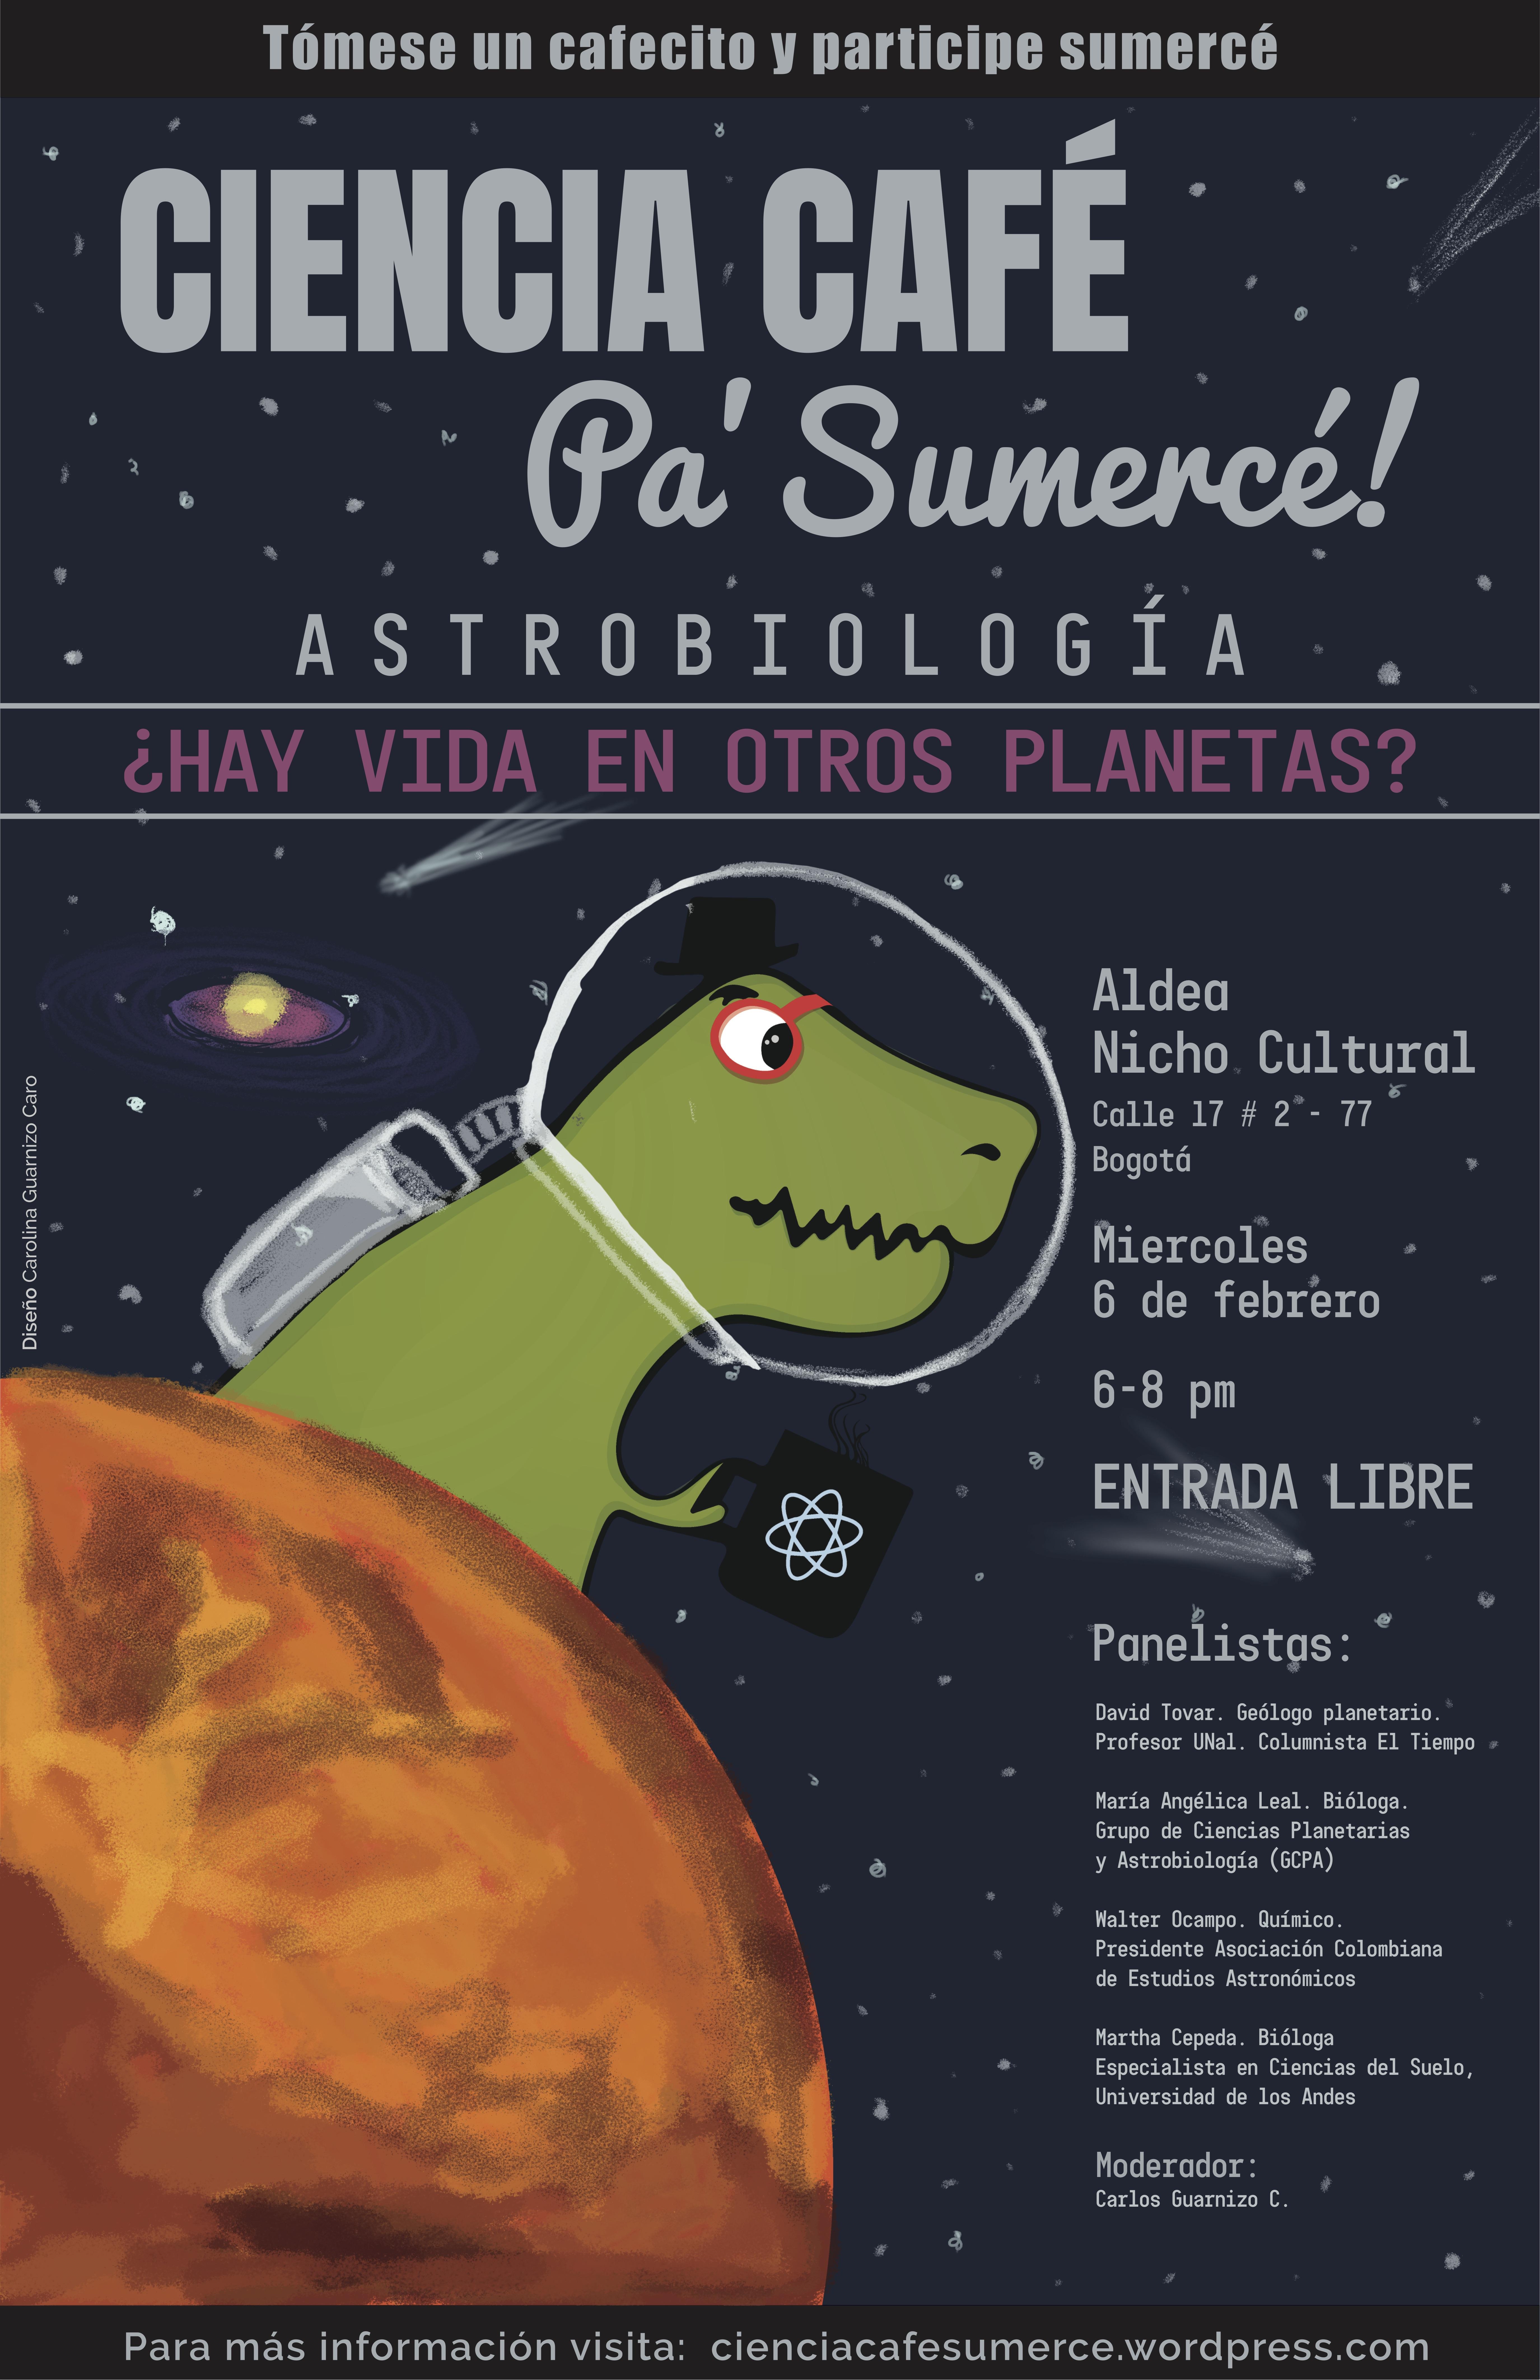 astrobiologia poster